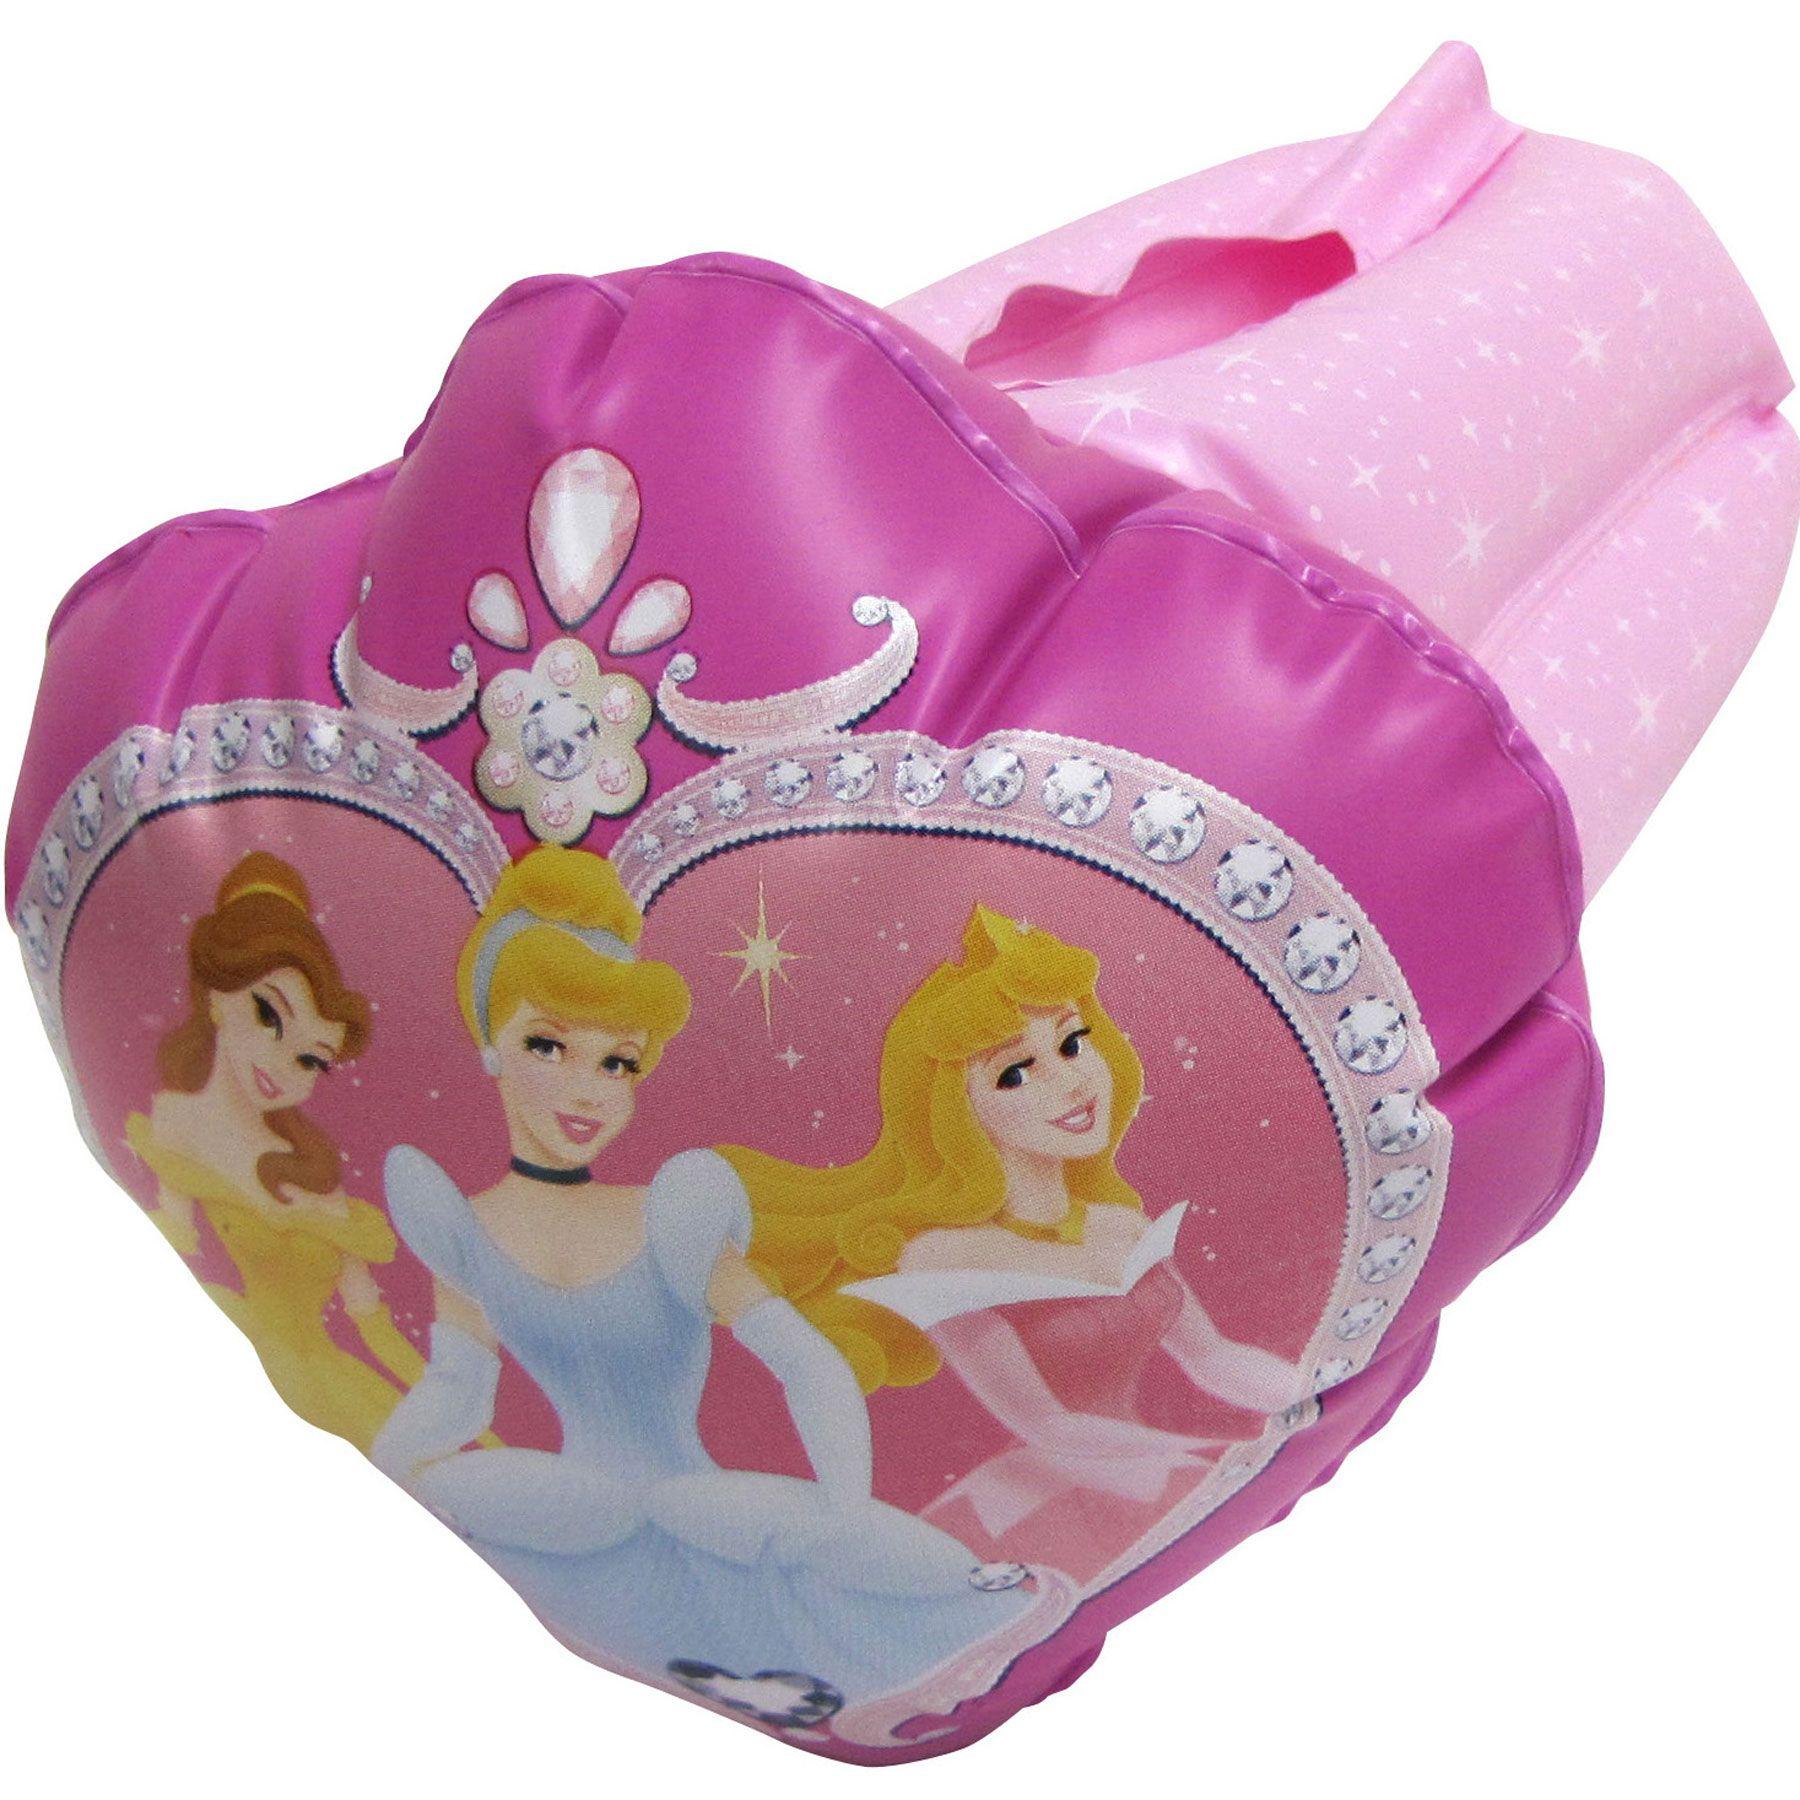 Inflatable Spout Cover featuring DISNEY PRINCESS | Princess